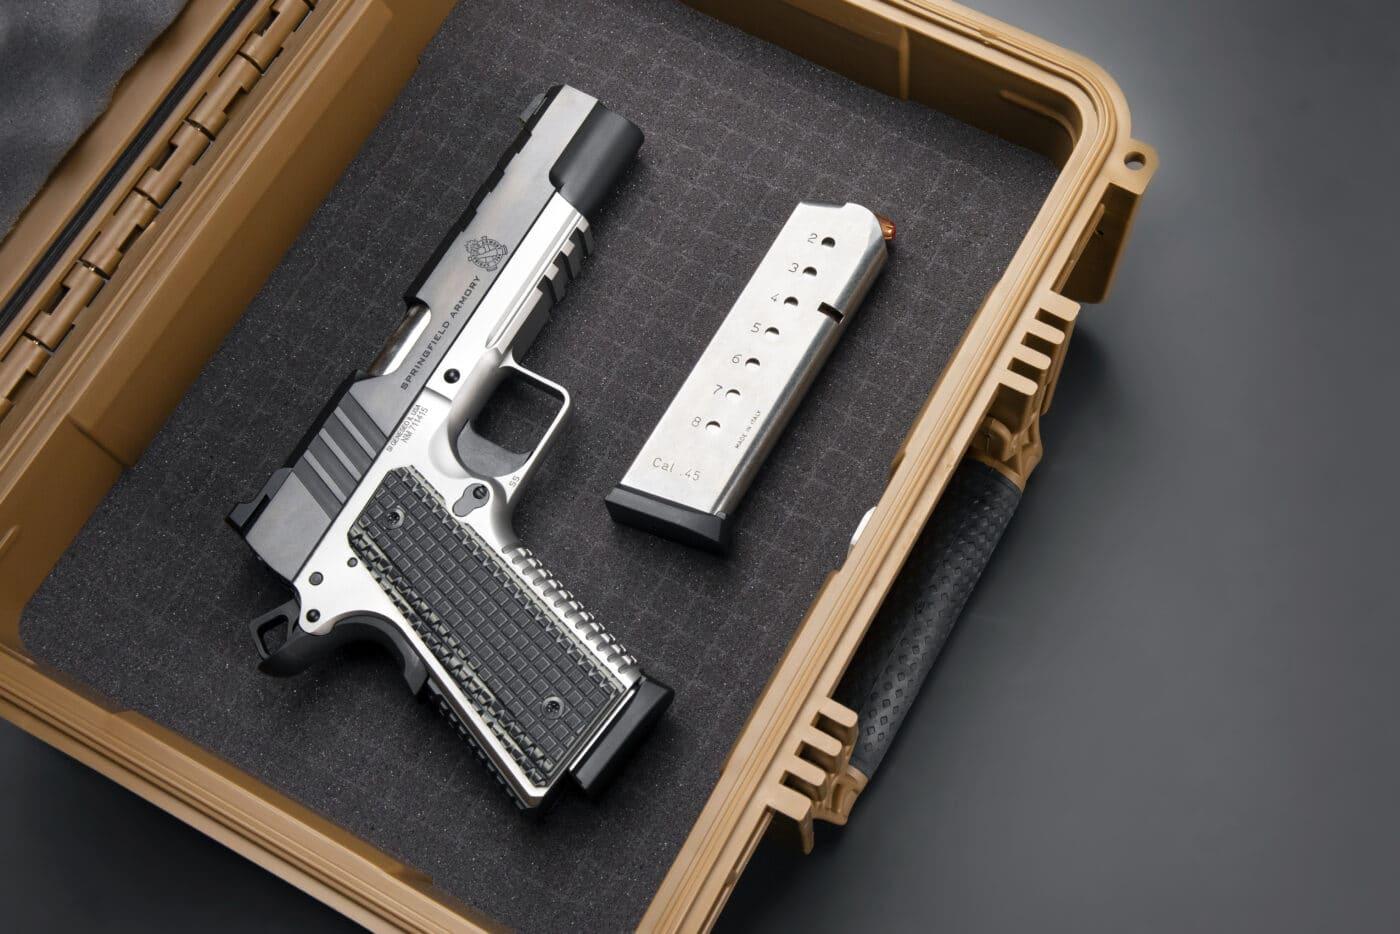 Springfield Emissary Emissary 1911 pistol in case